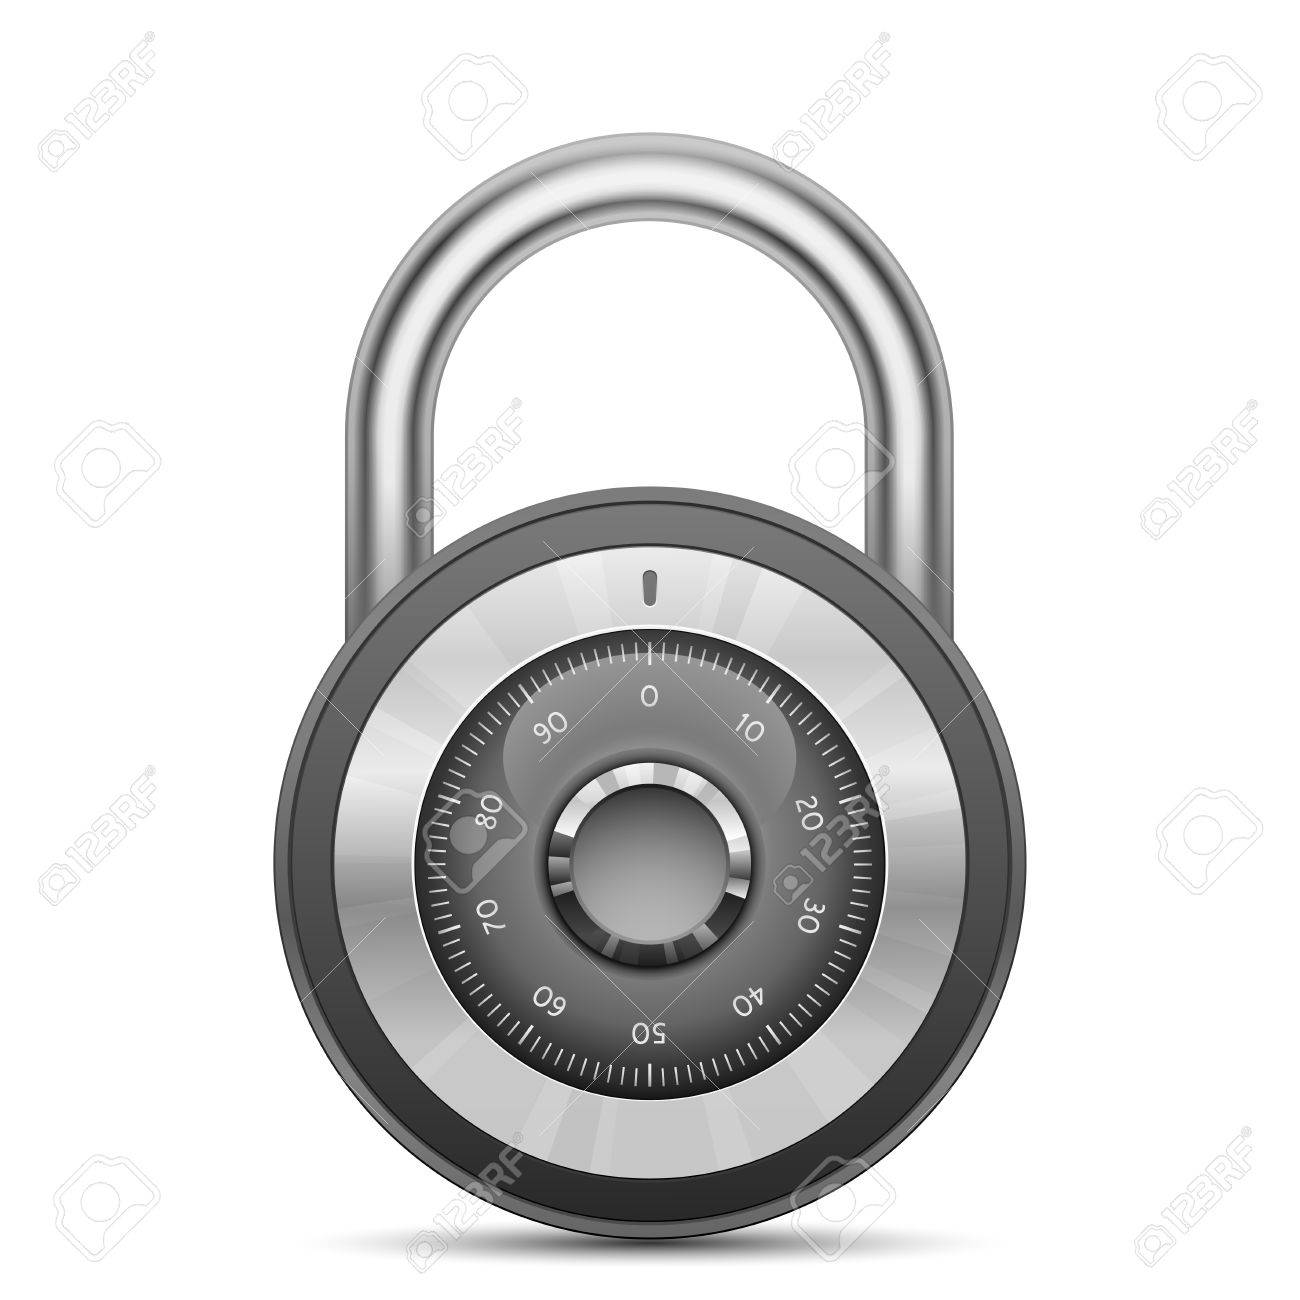 Security combination lock. Vector illustration of padlock Stock Vector - 23865805